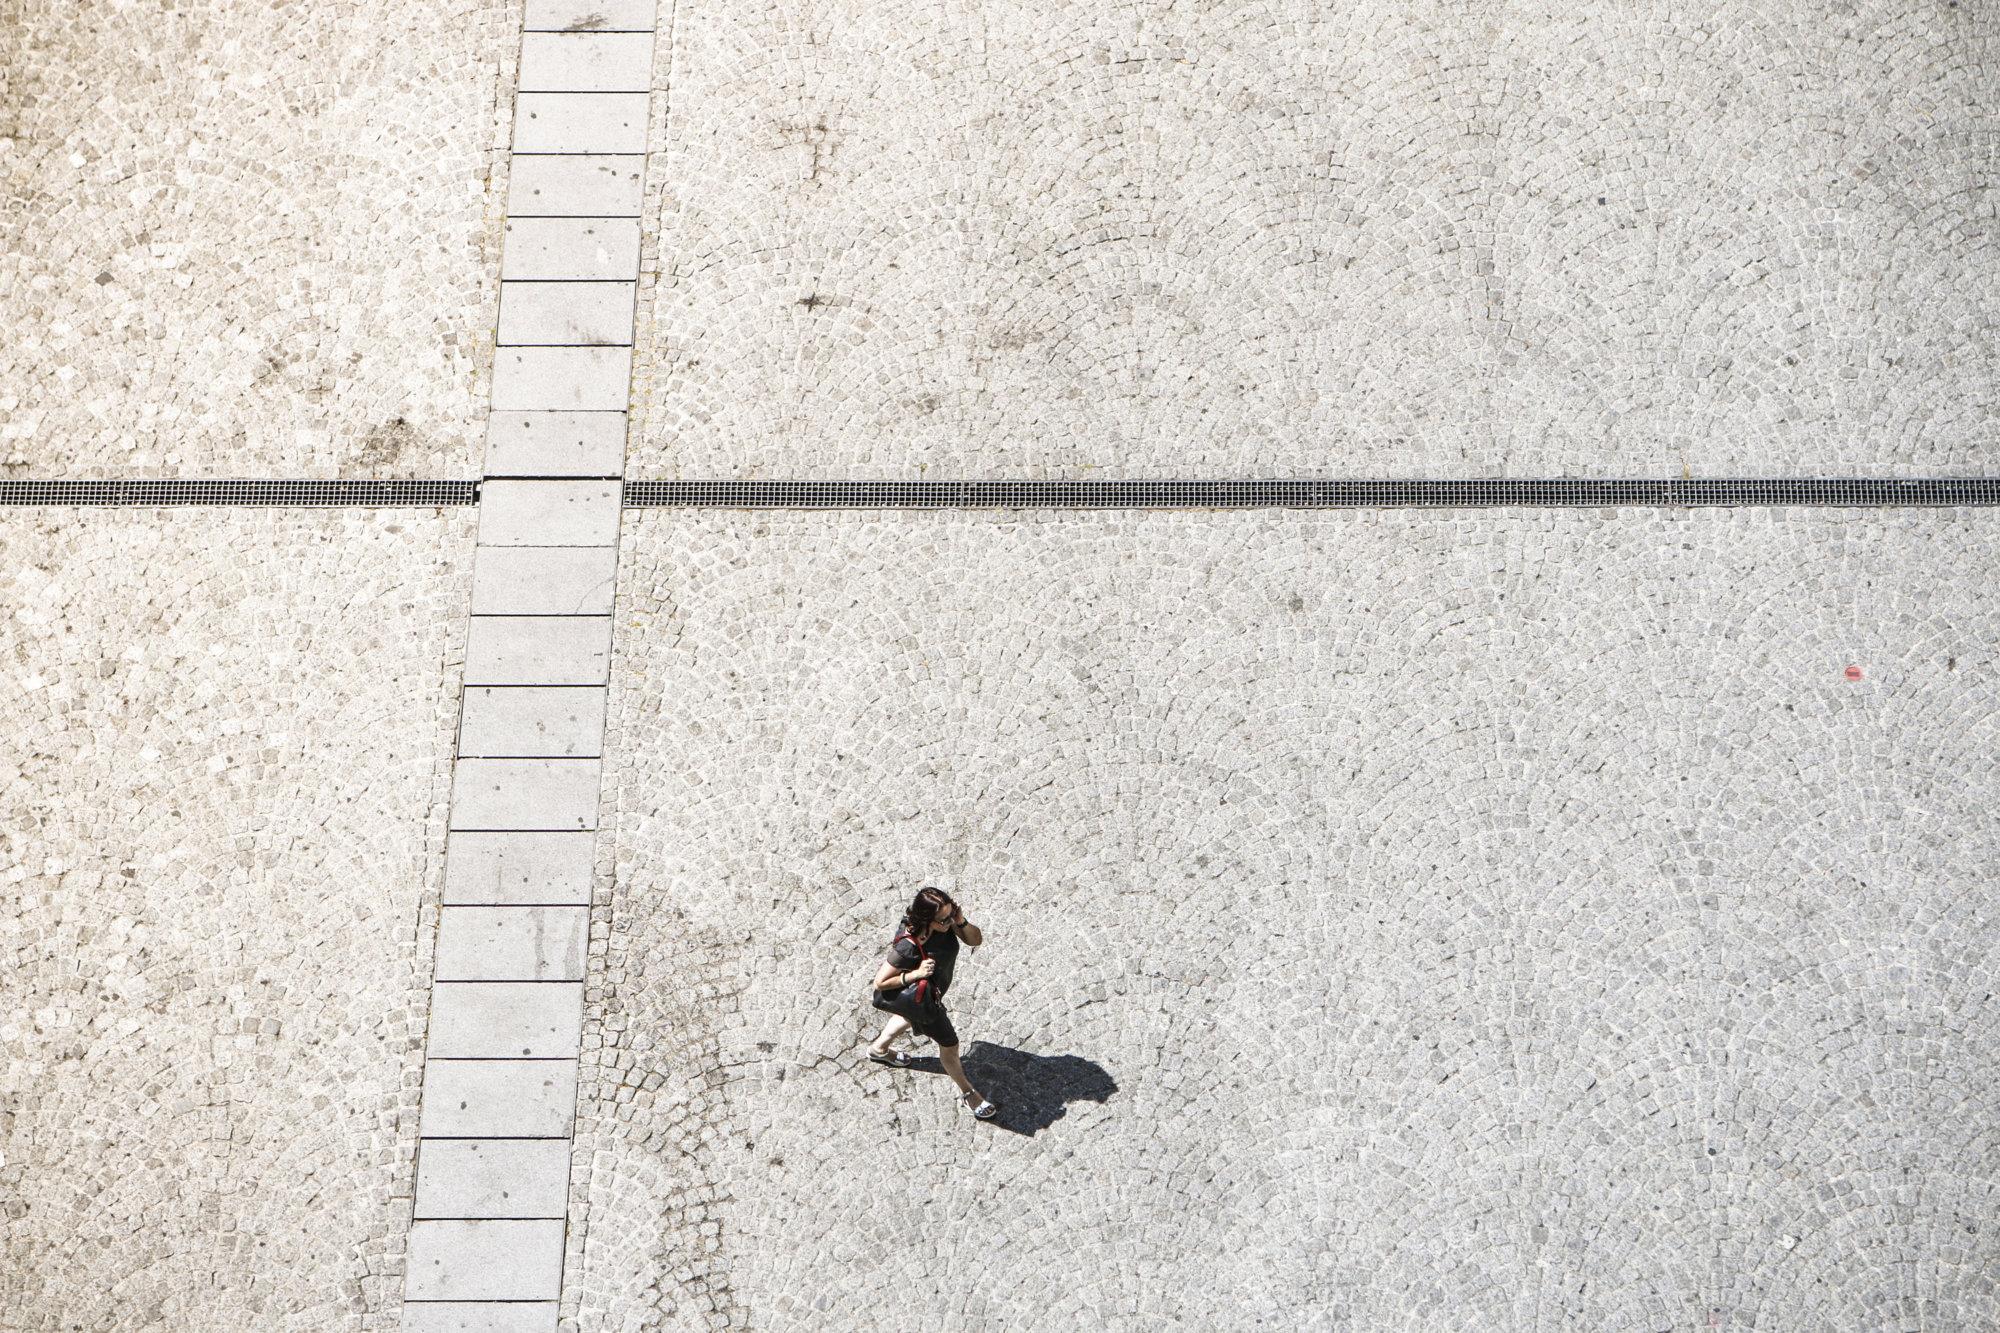 je-suis-in-paris-gsi-juli-2015-fabian-gruber-9